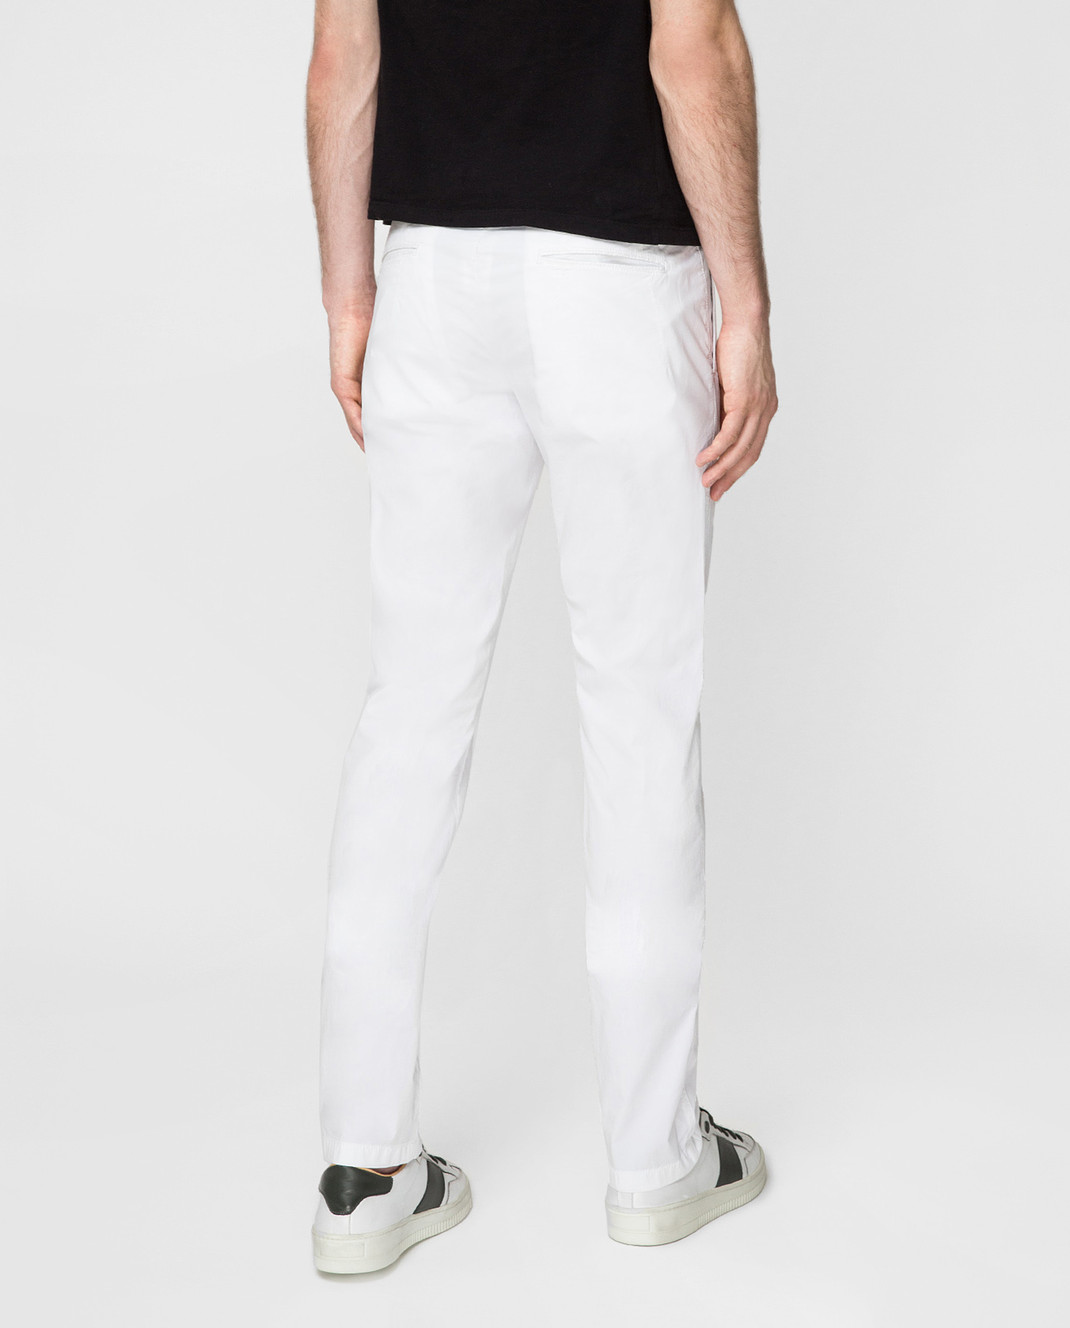 Kiton Белые брюки UPCAPRJ07R90 изображение 4